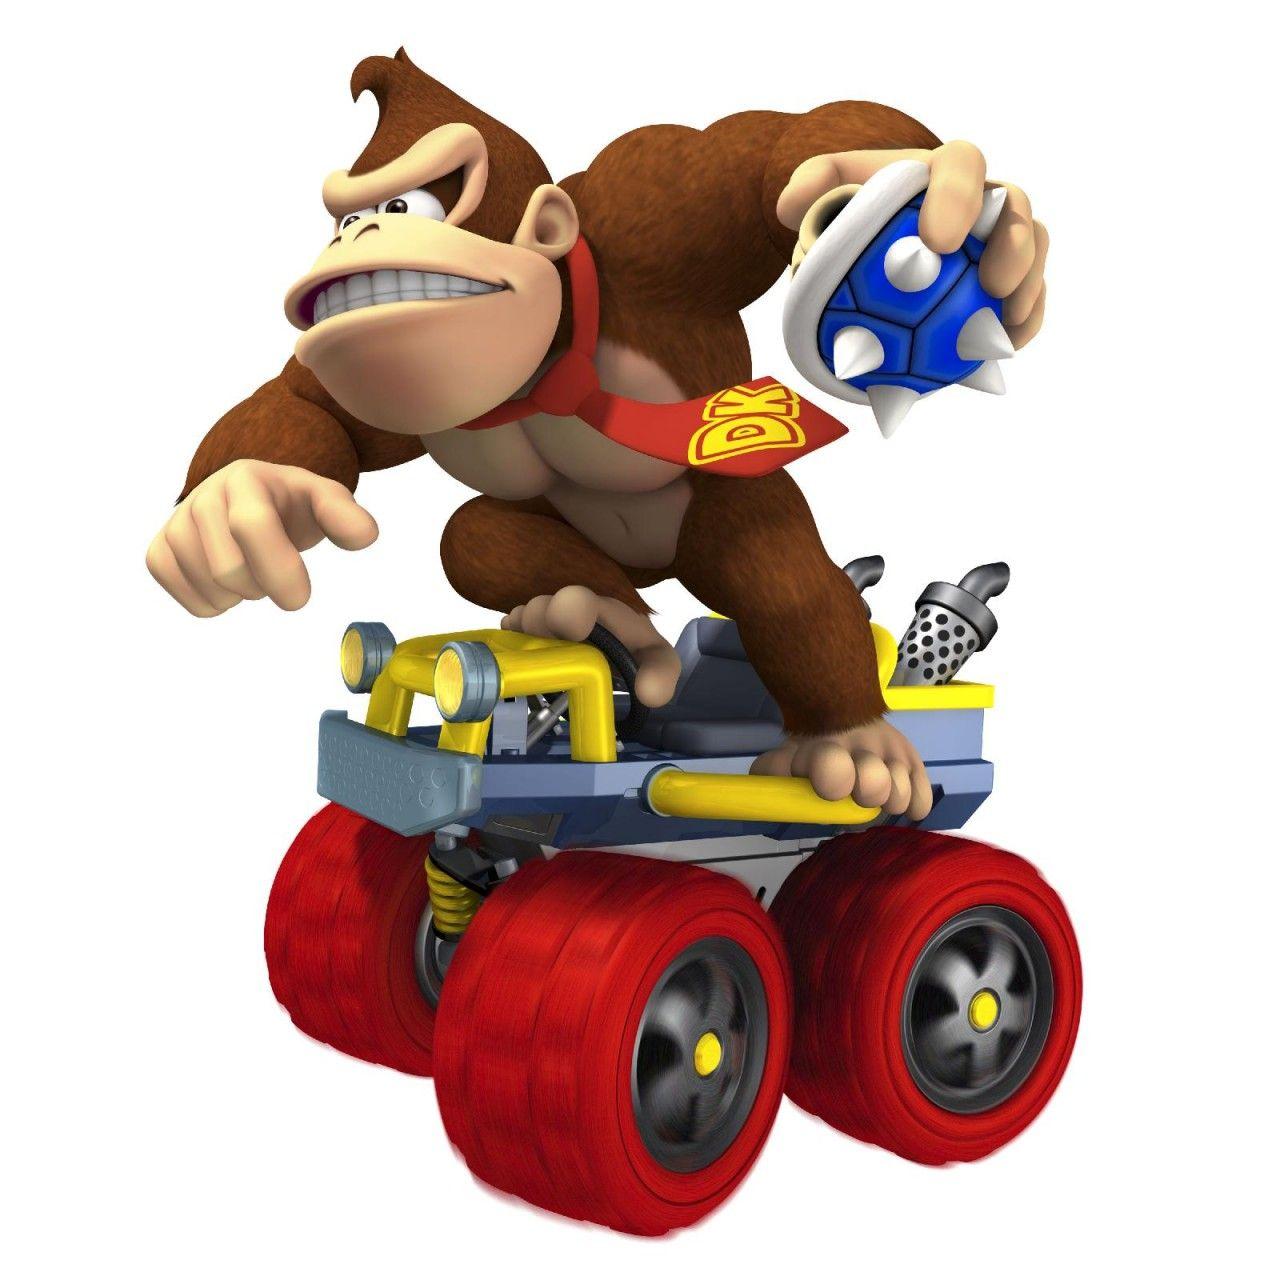 Mario Kart 7 Nouveau Trailer Mario Et Luigi Super Mario Bros Mario Kart